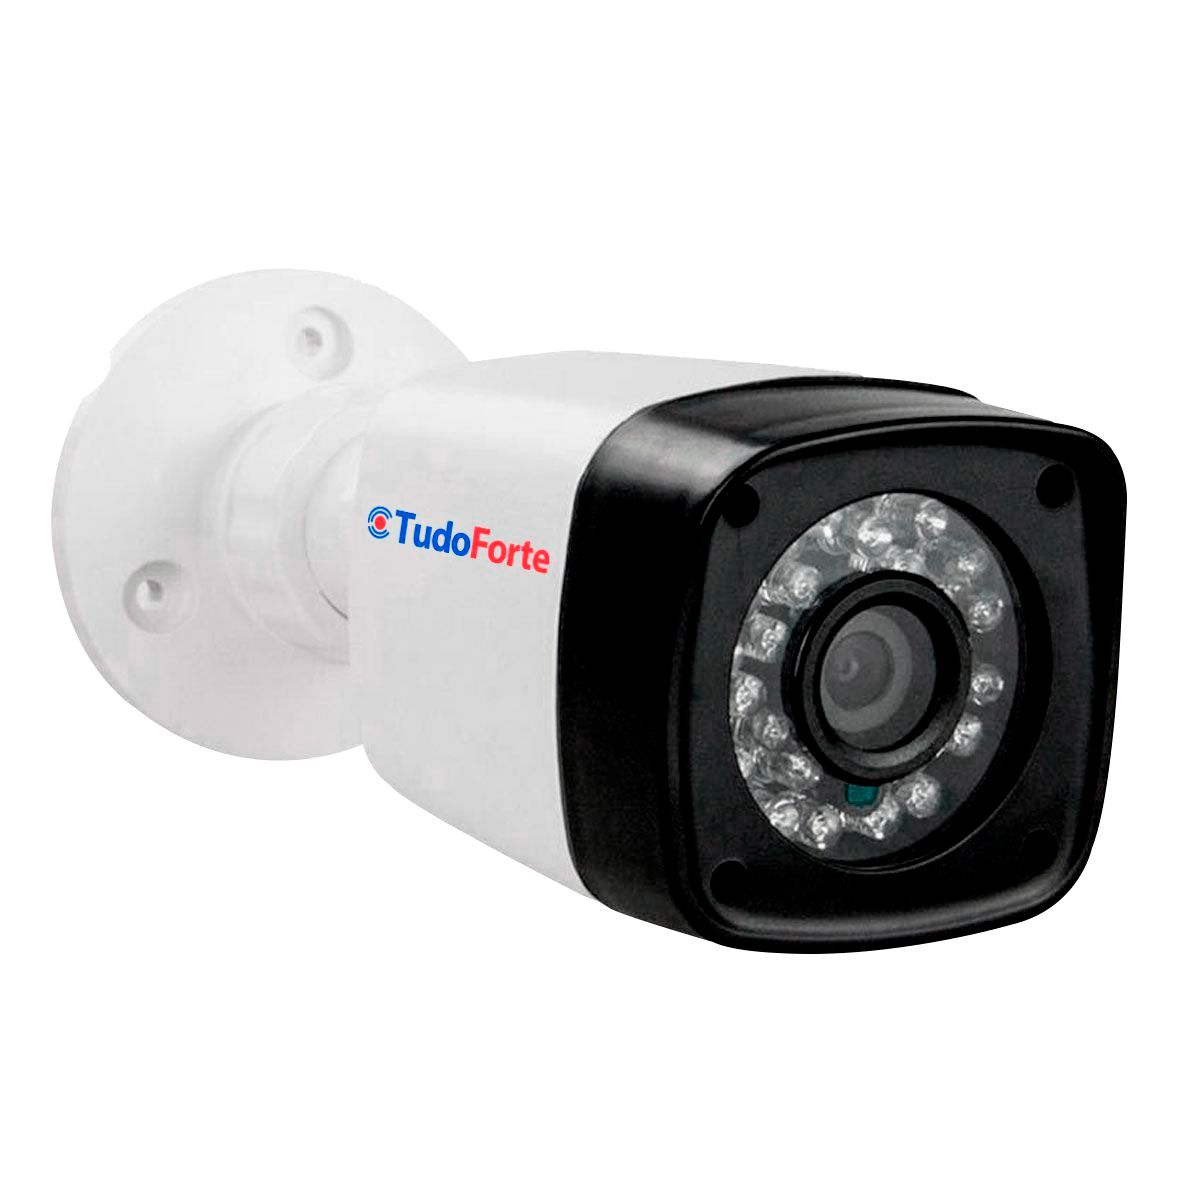 "Kit 02 Câmeras Infra Bullet + Tela Monitor 7"" LCD Colorido + Acessórios  - Tudo Forte"